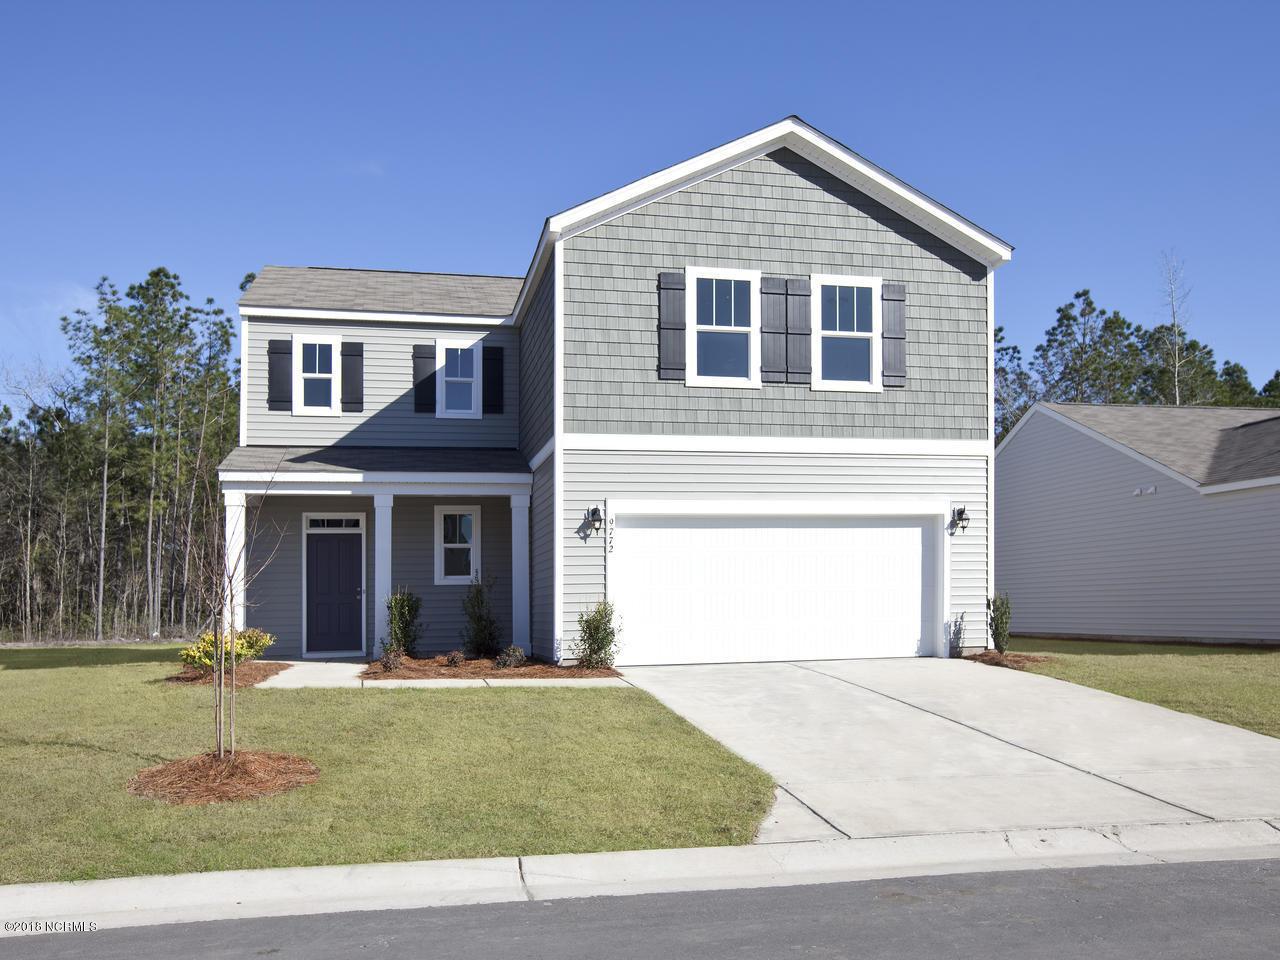 9793 Woodriff Circle #lot 32 Leland, NC 28451